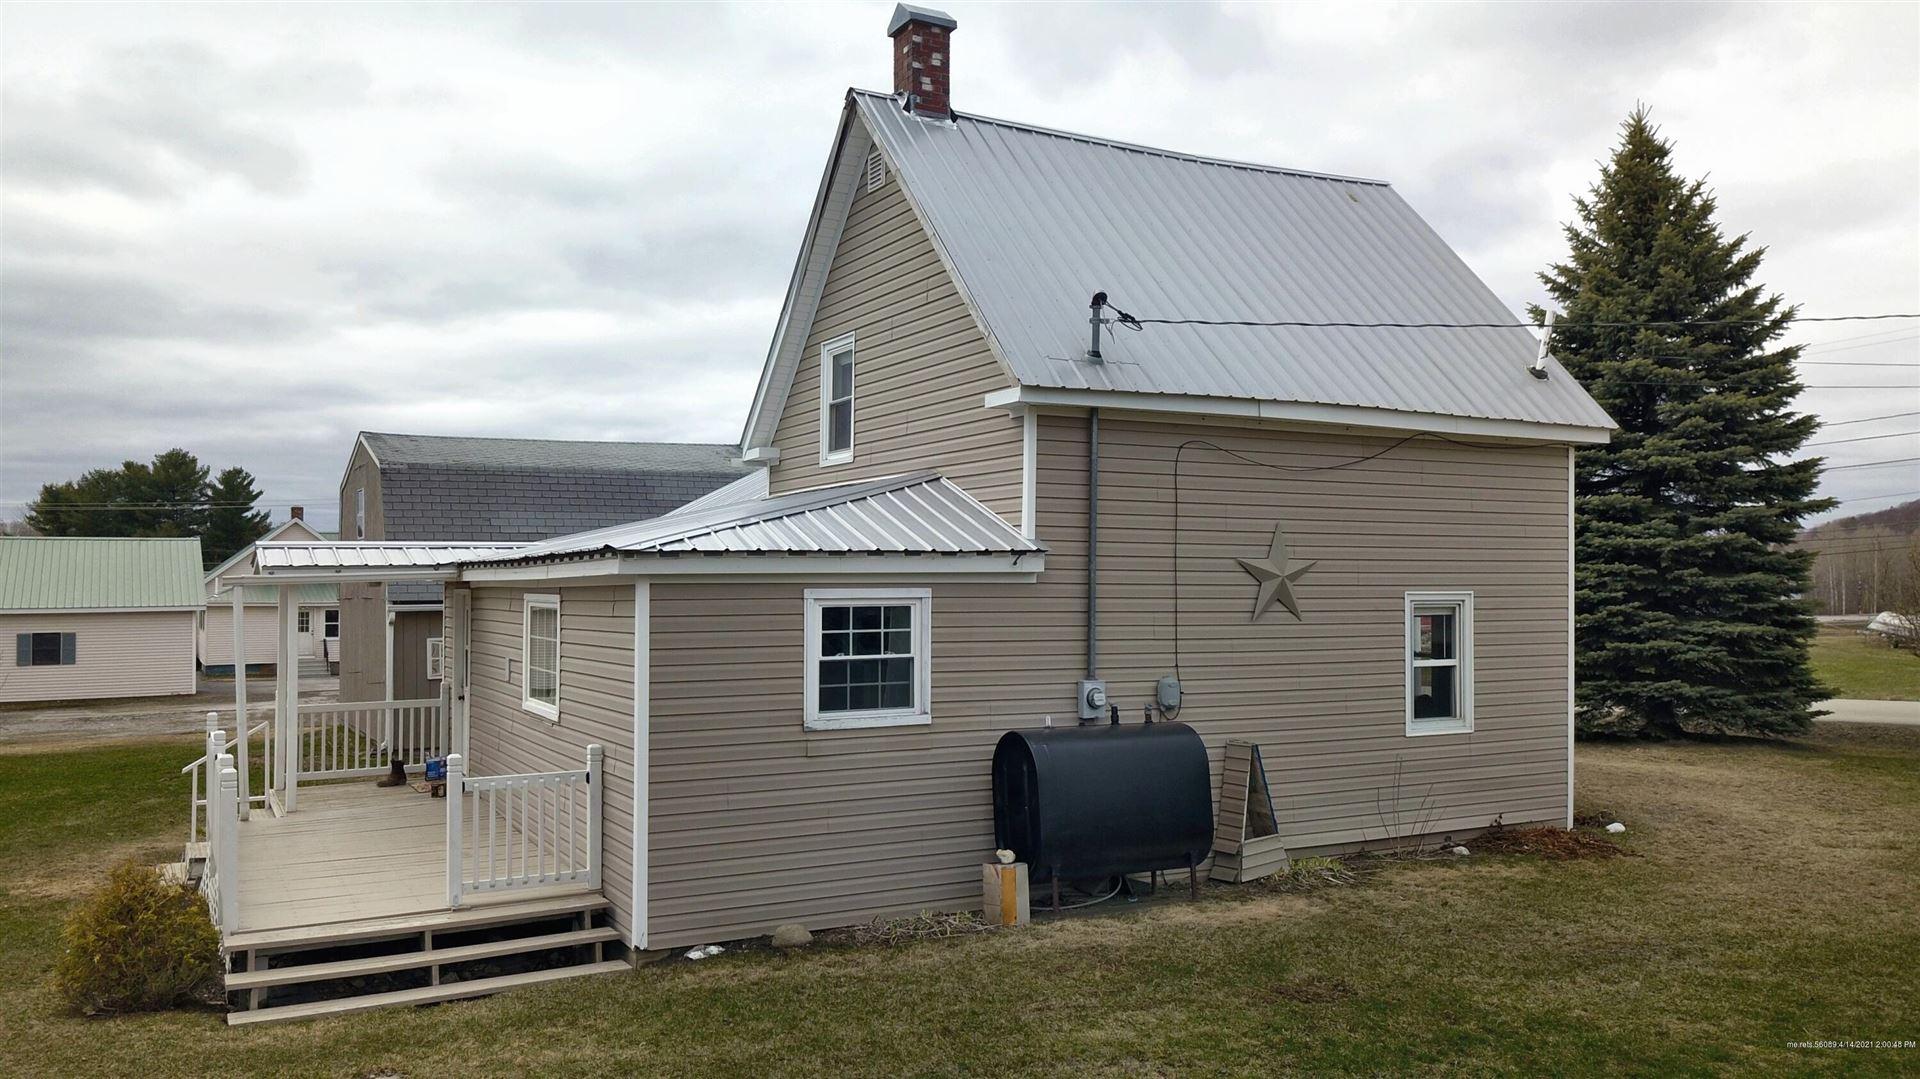 Photo of 8 School Street, Portage Lake, ME 04768 (MLS # 1487590)